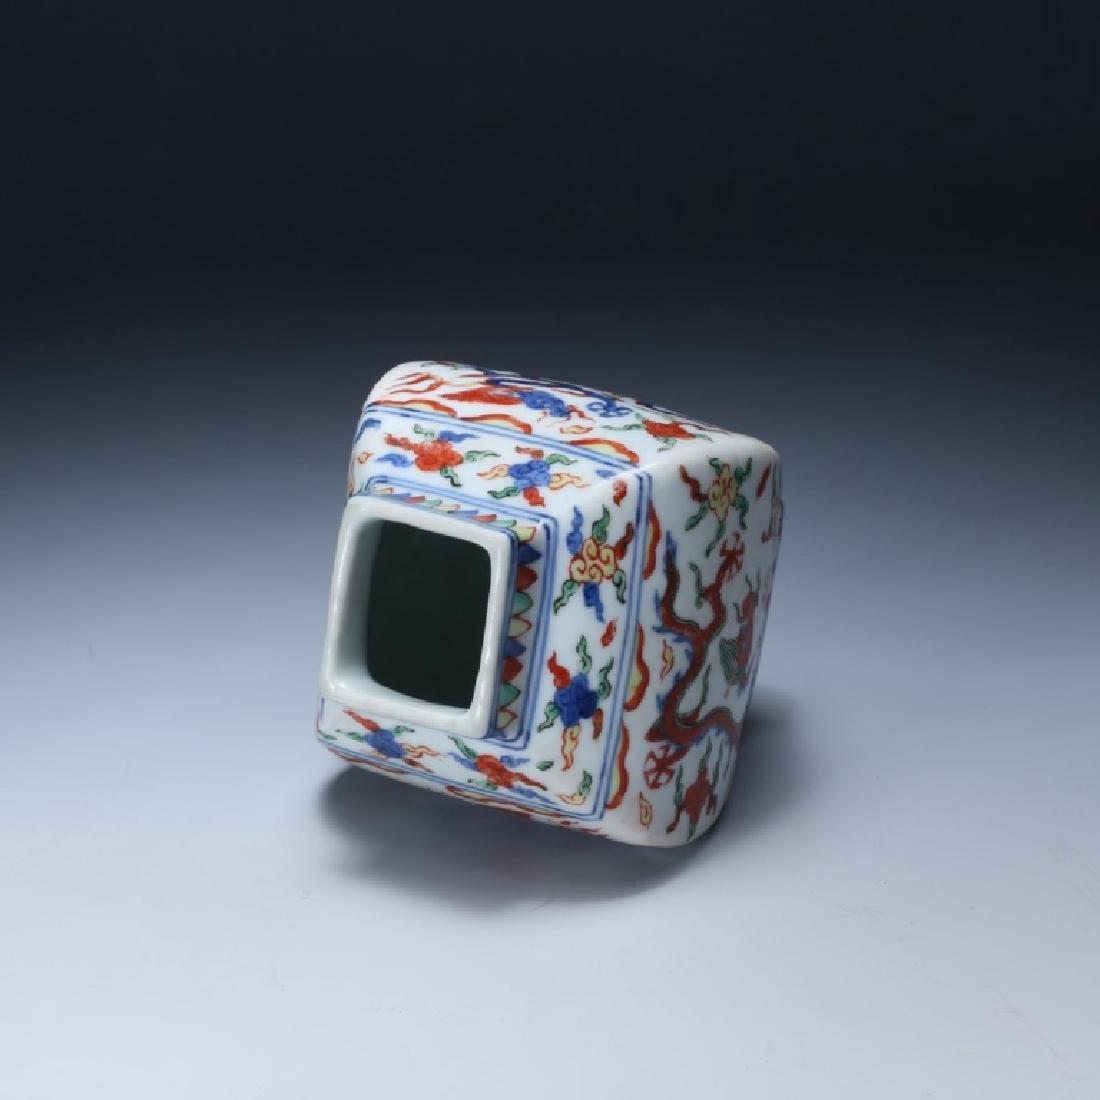 Chinese Qing Dynasty Wucai Porcelain Jar - 3